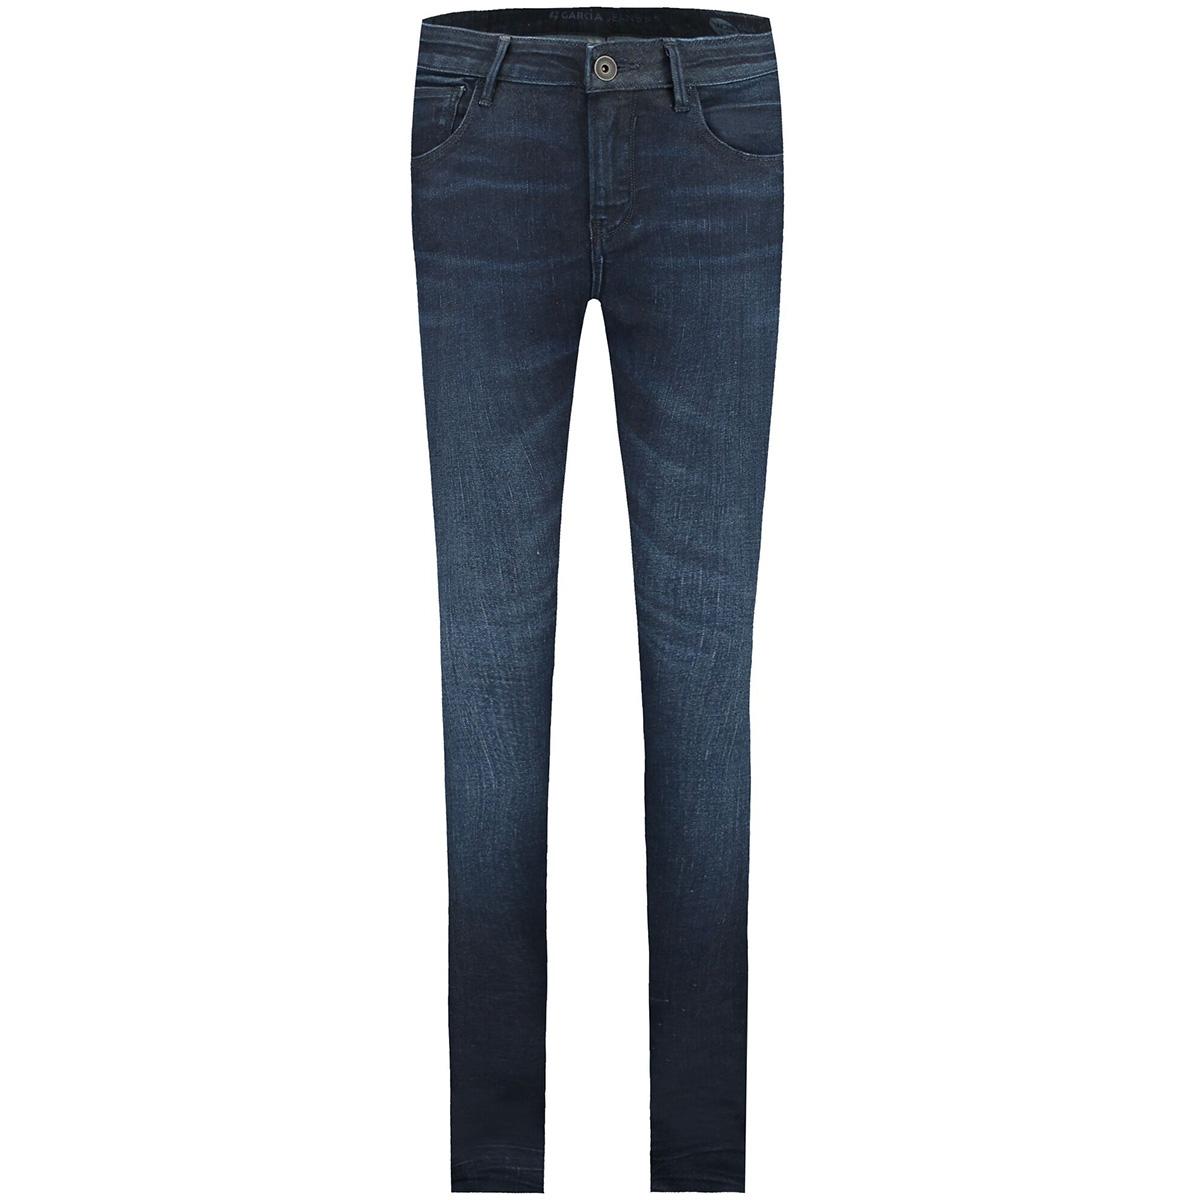 celia 244 garcia jeans dark used 4953